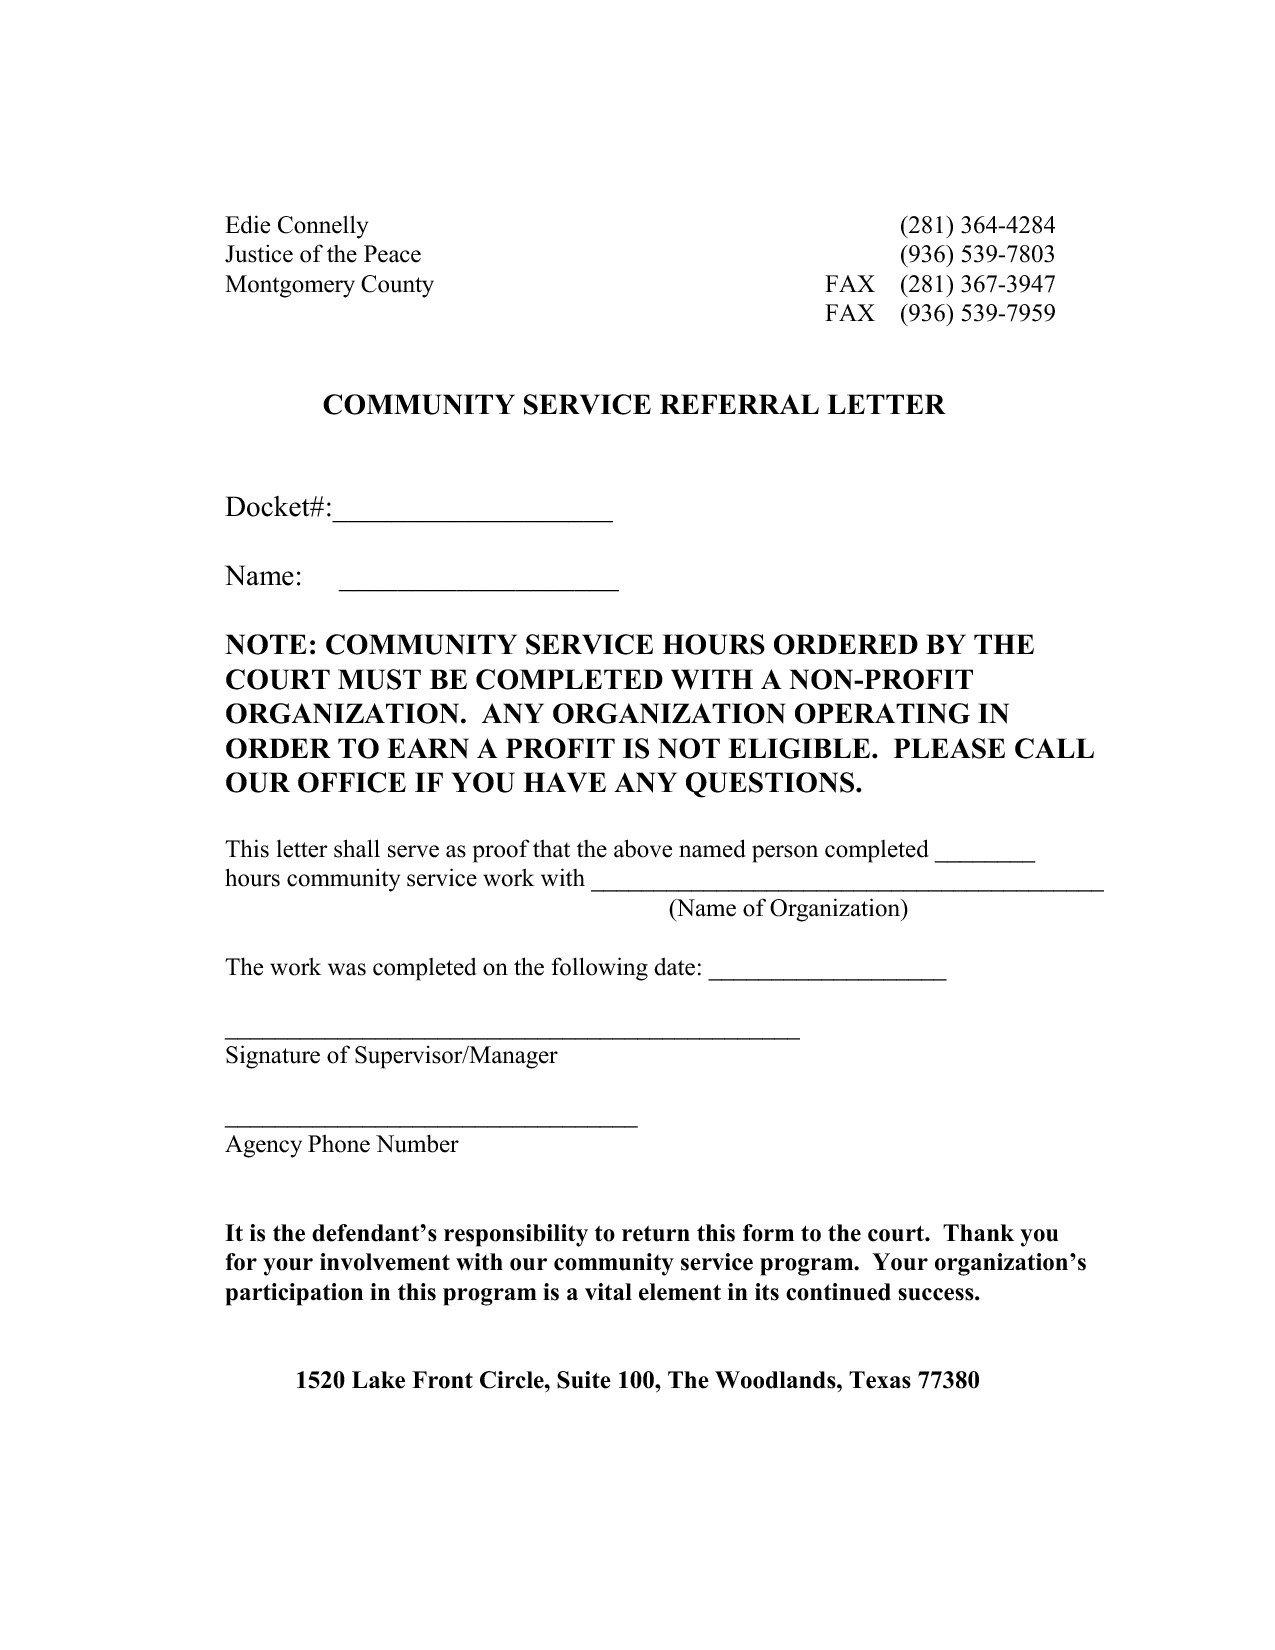 Sample Community Service Letter Munity Service Letter